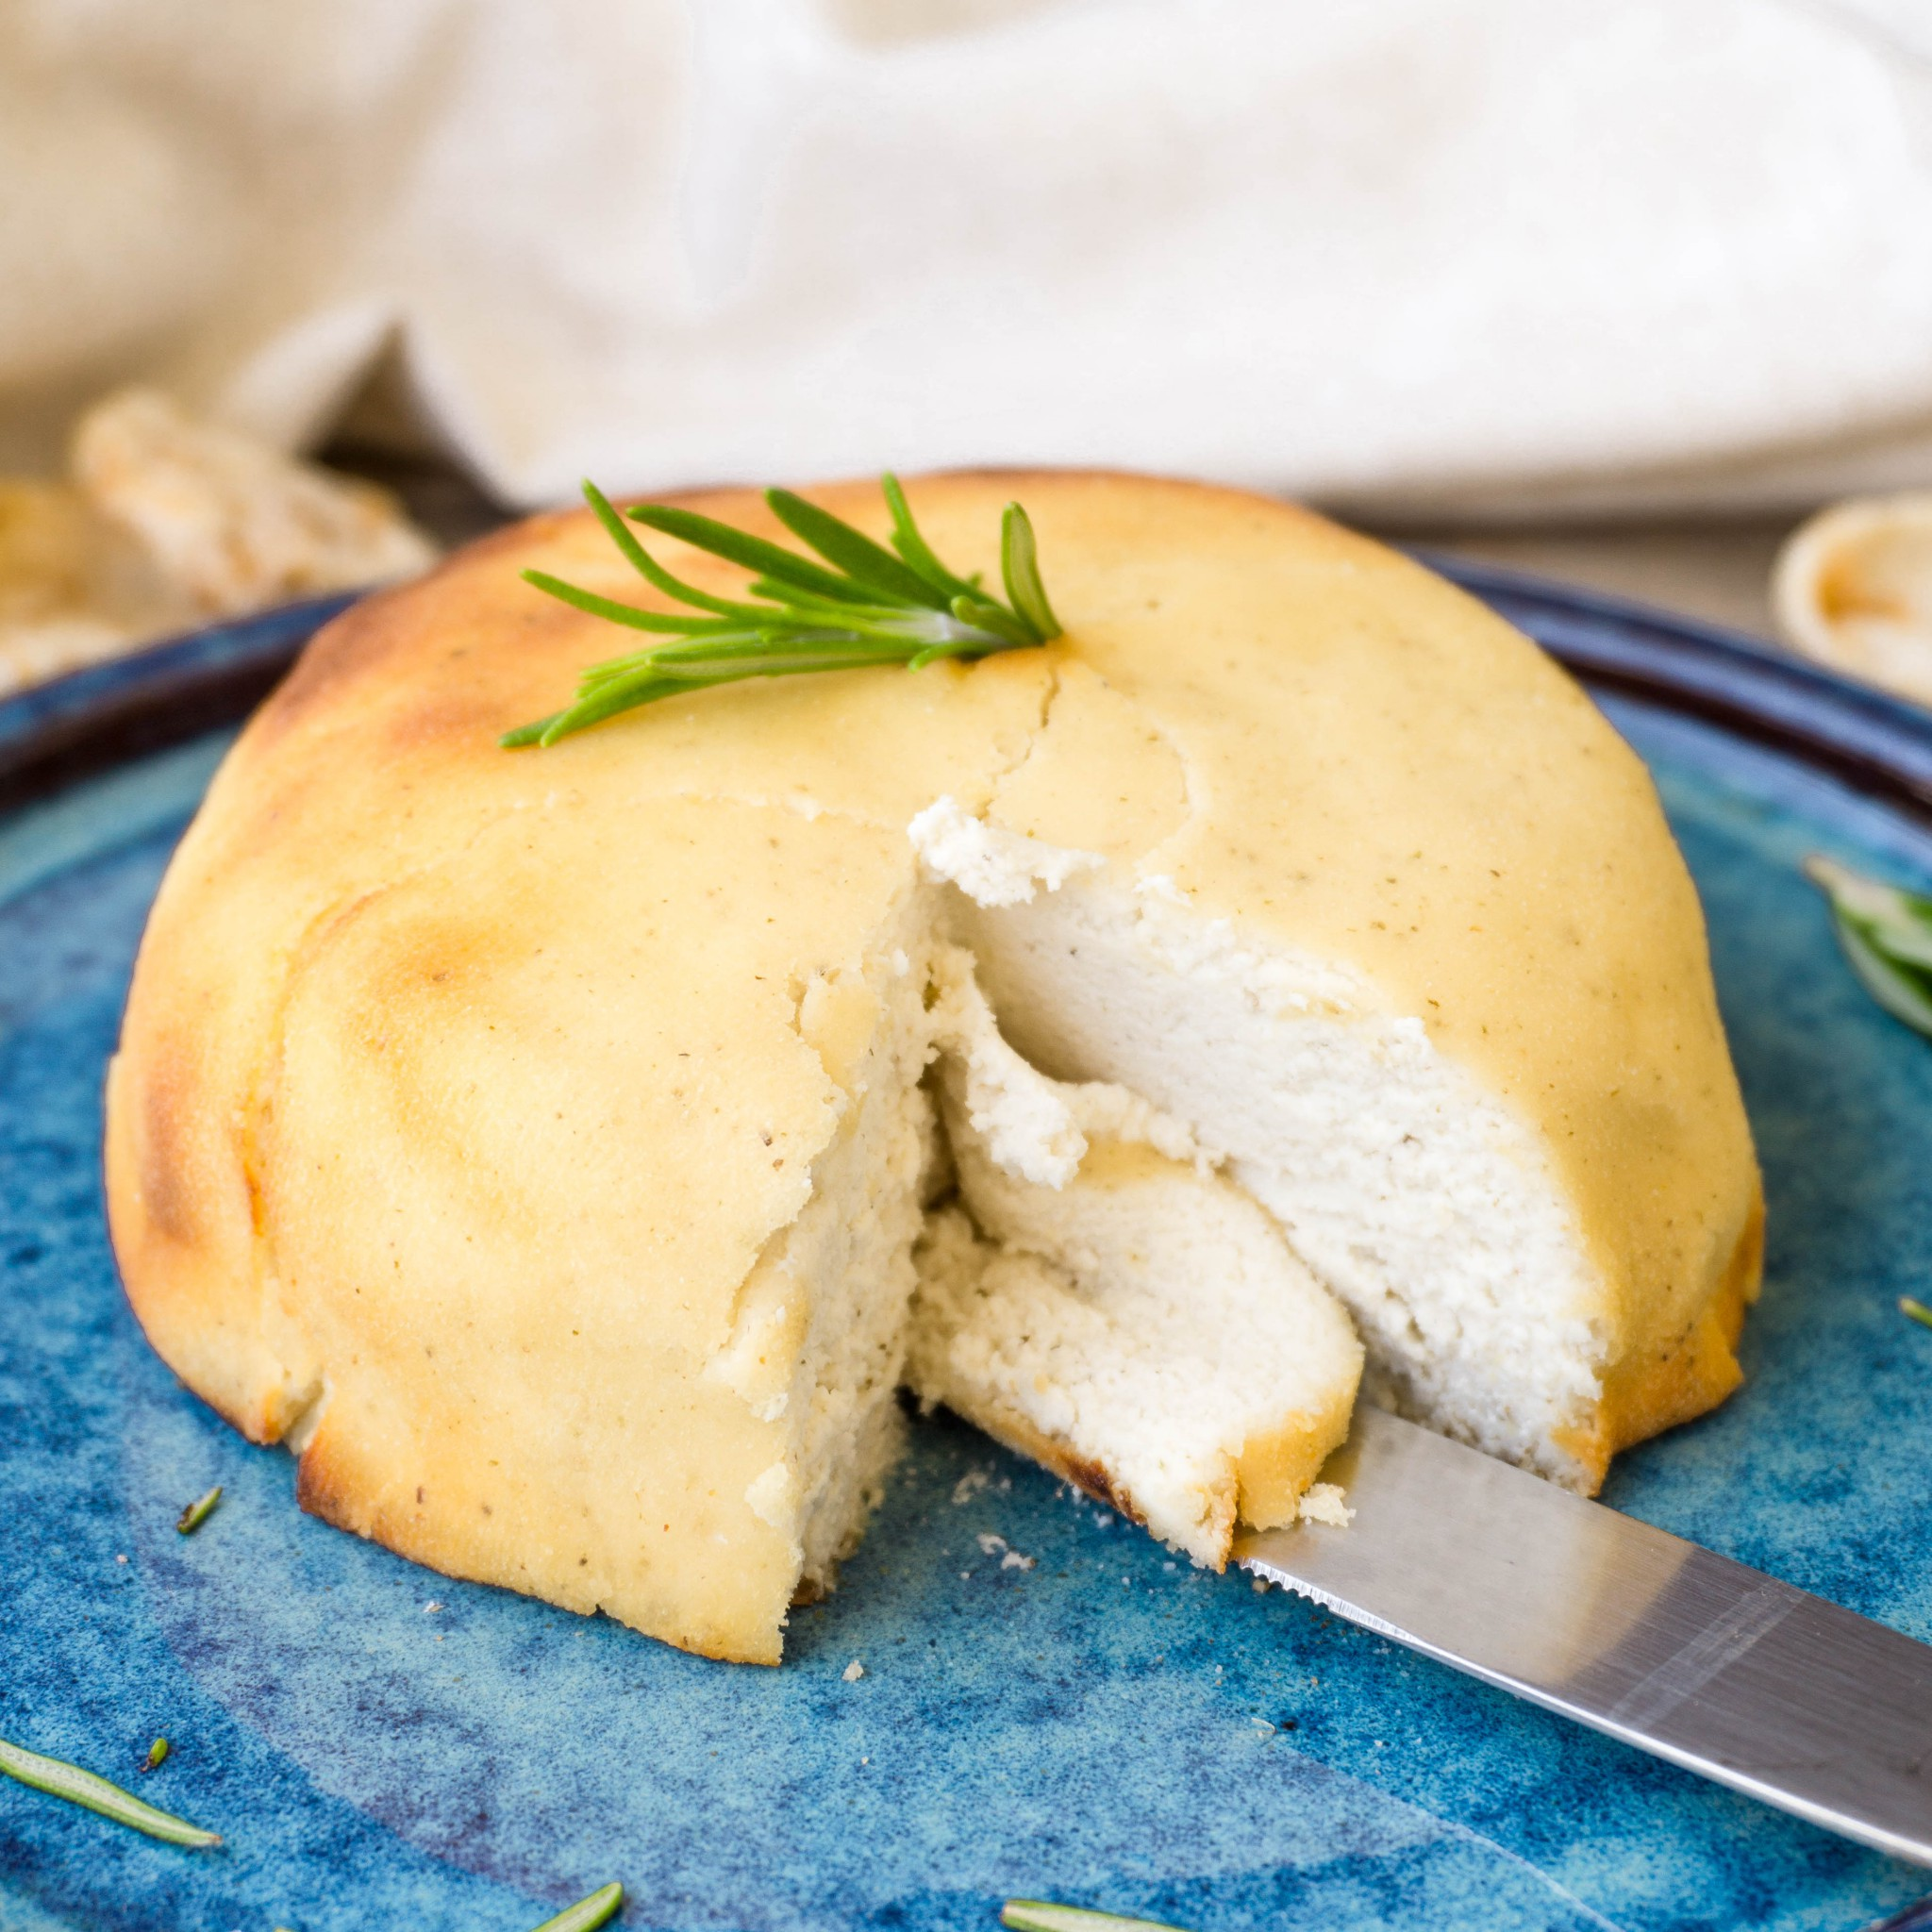 Baked Macadamia Feta